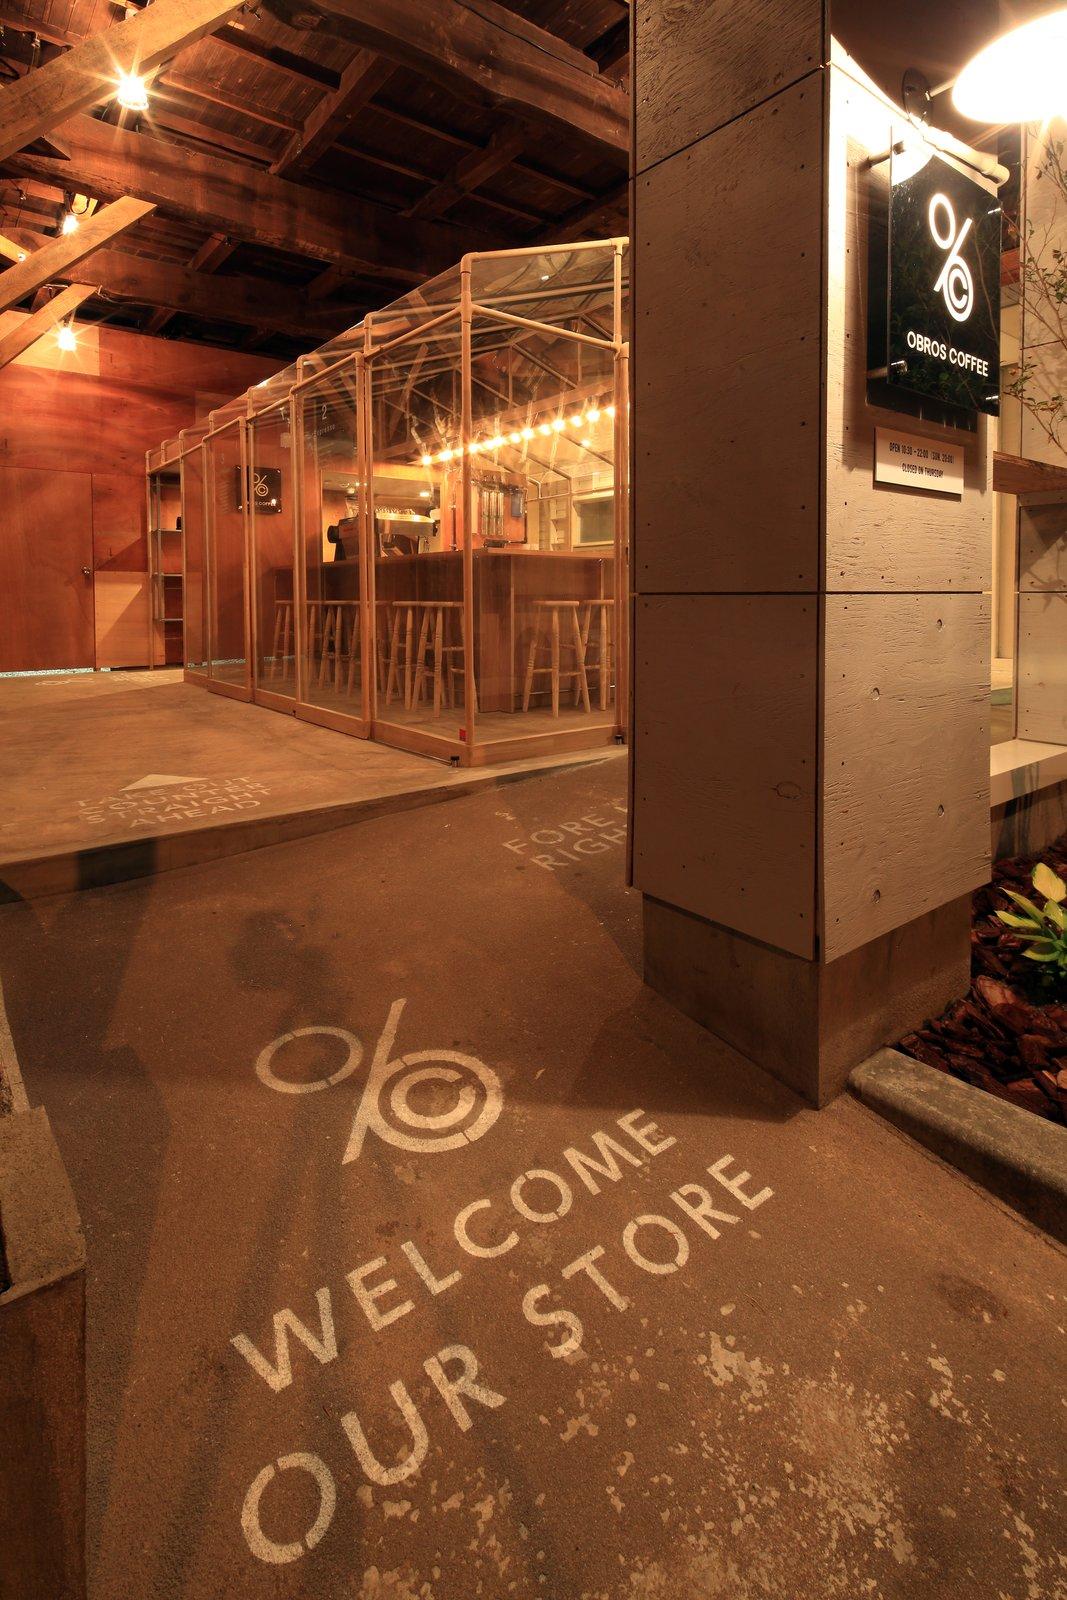 OBROS COFFEE by Life style koubou